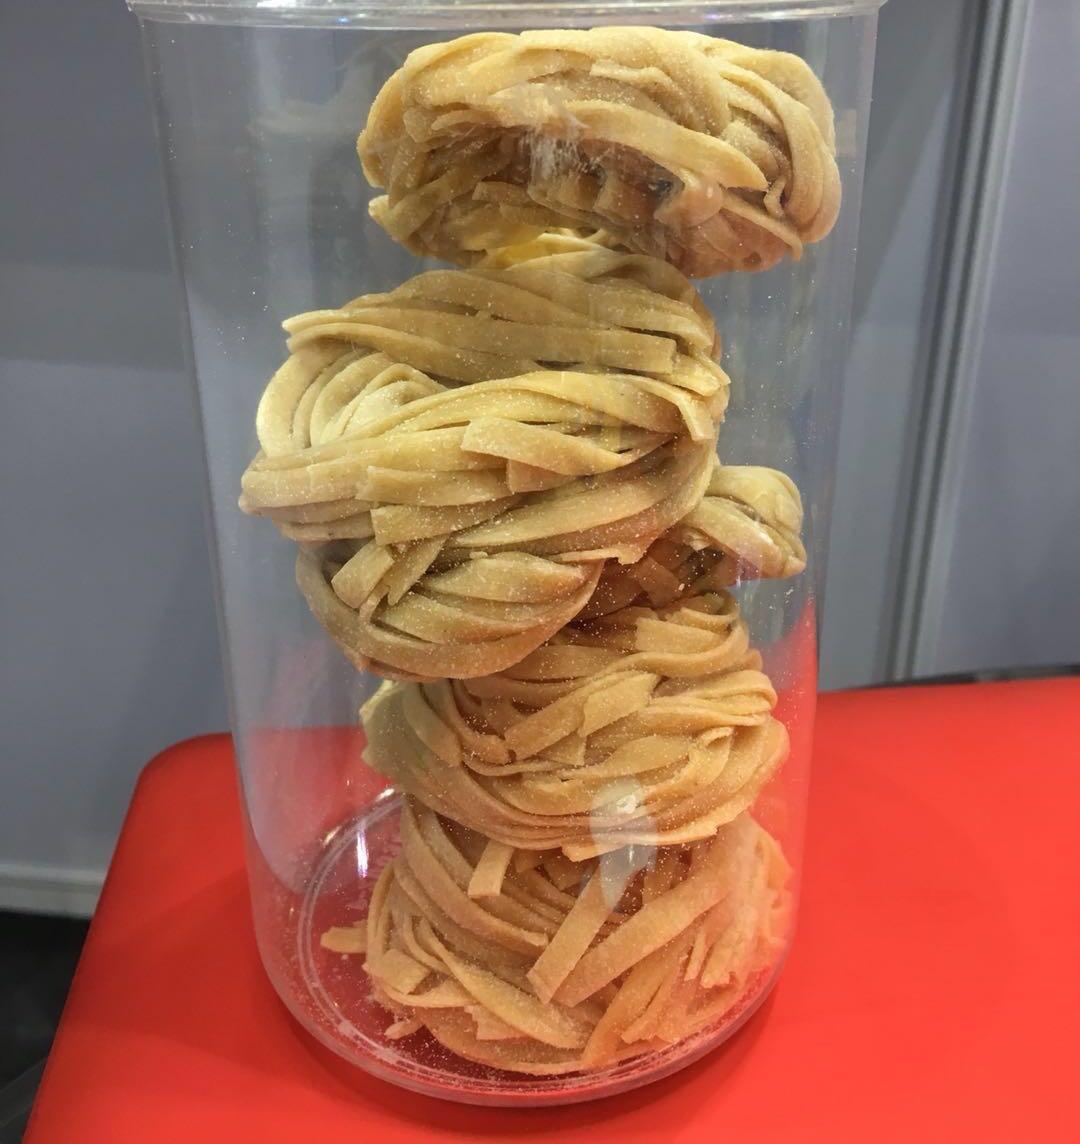 Banana / Durian Pasta